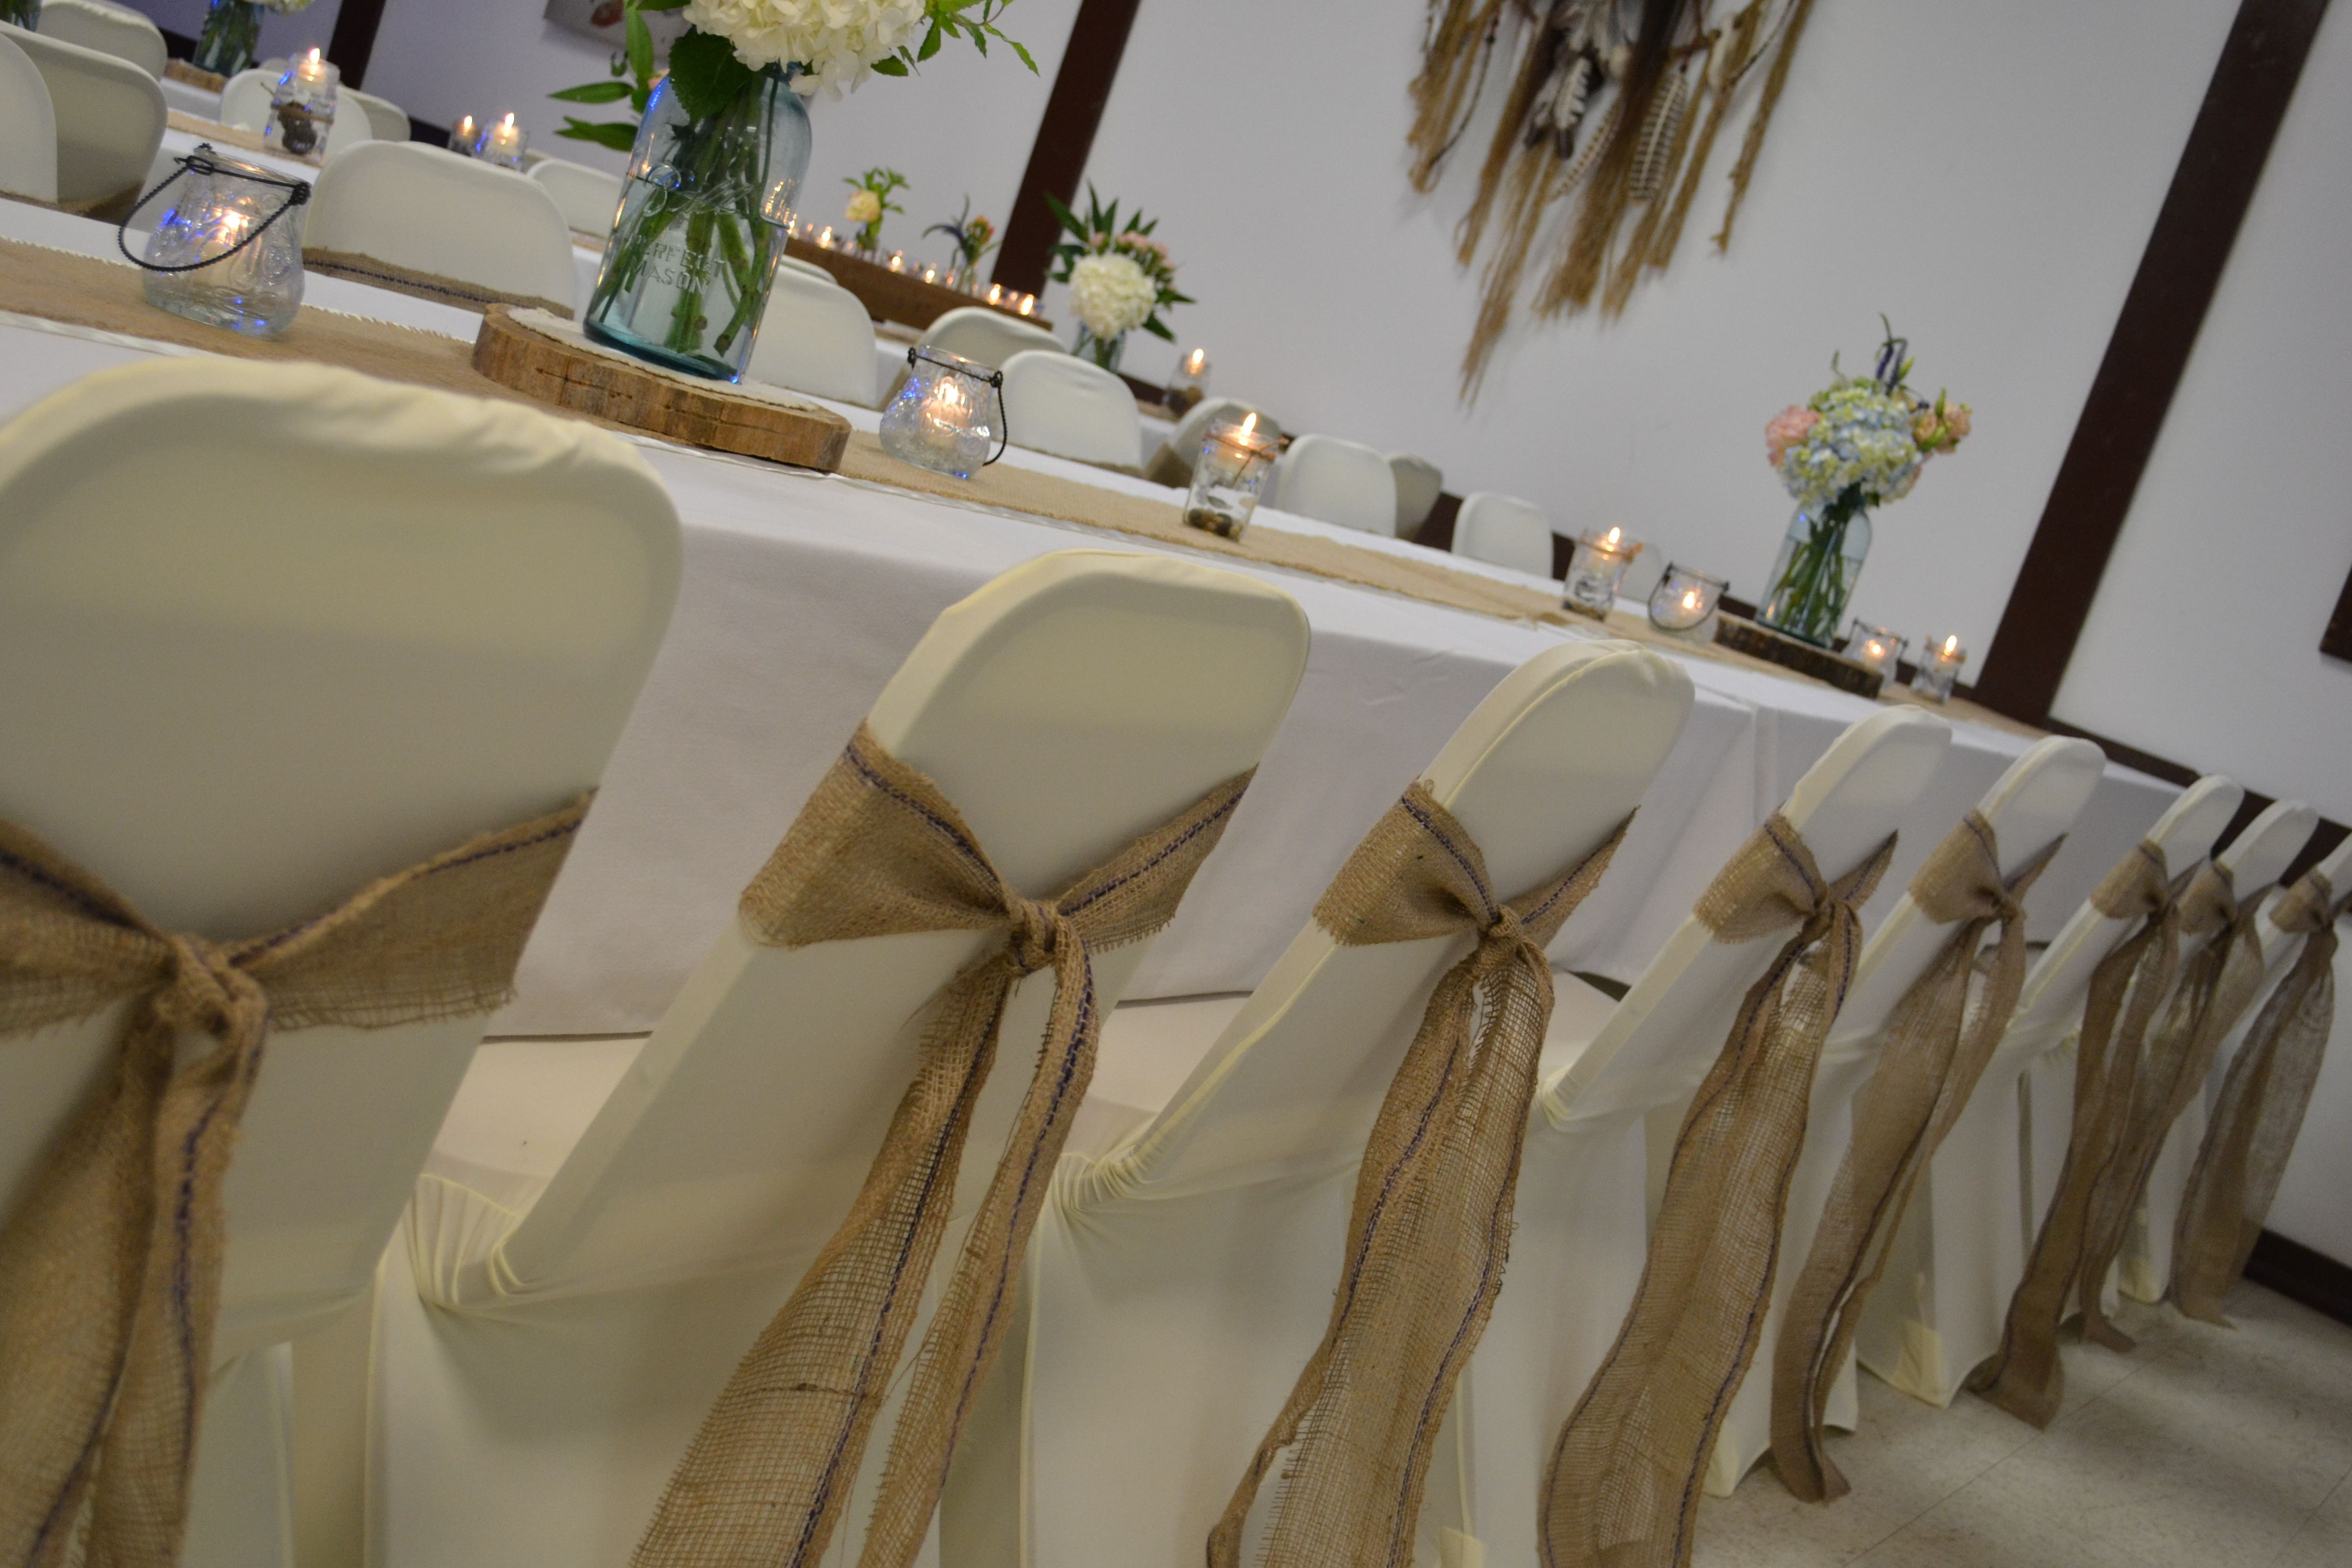 burlap chair covers wedding glider cushions sashes rustic weddings pinterest